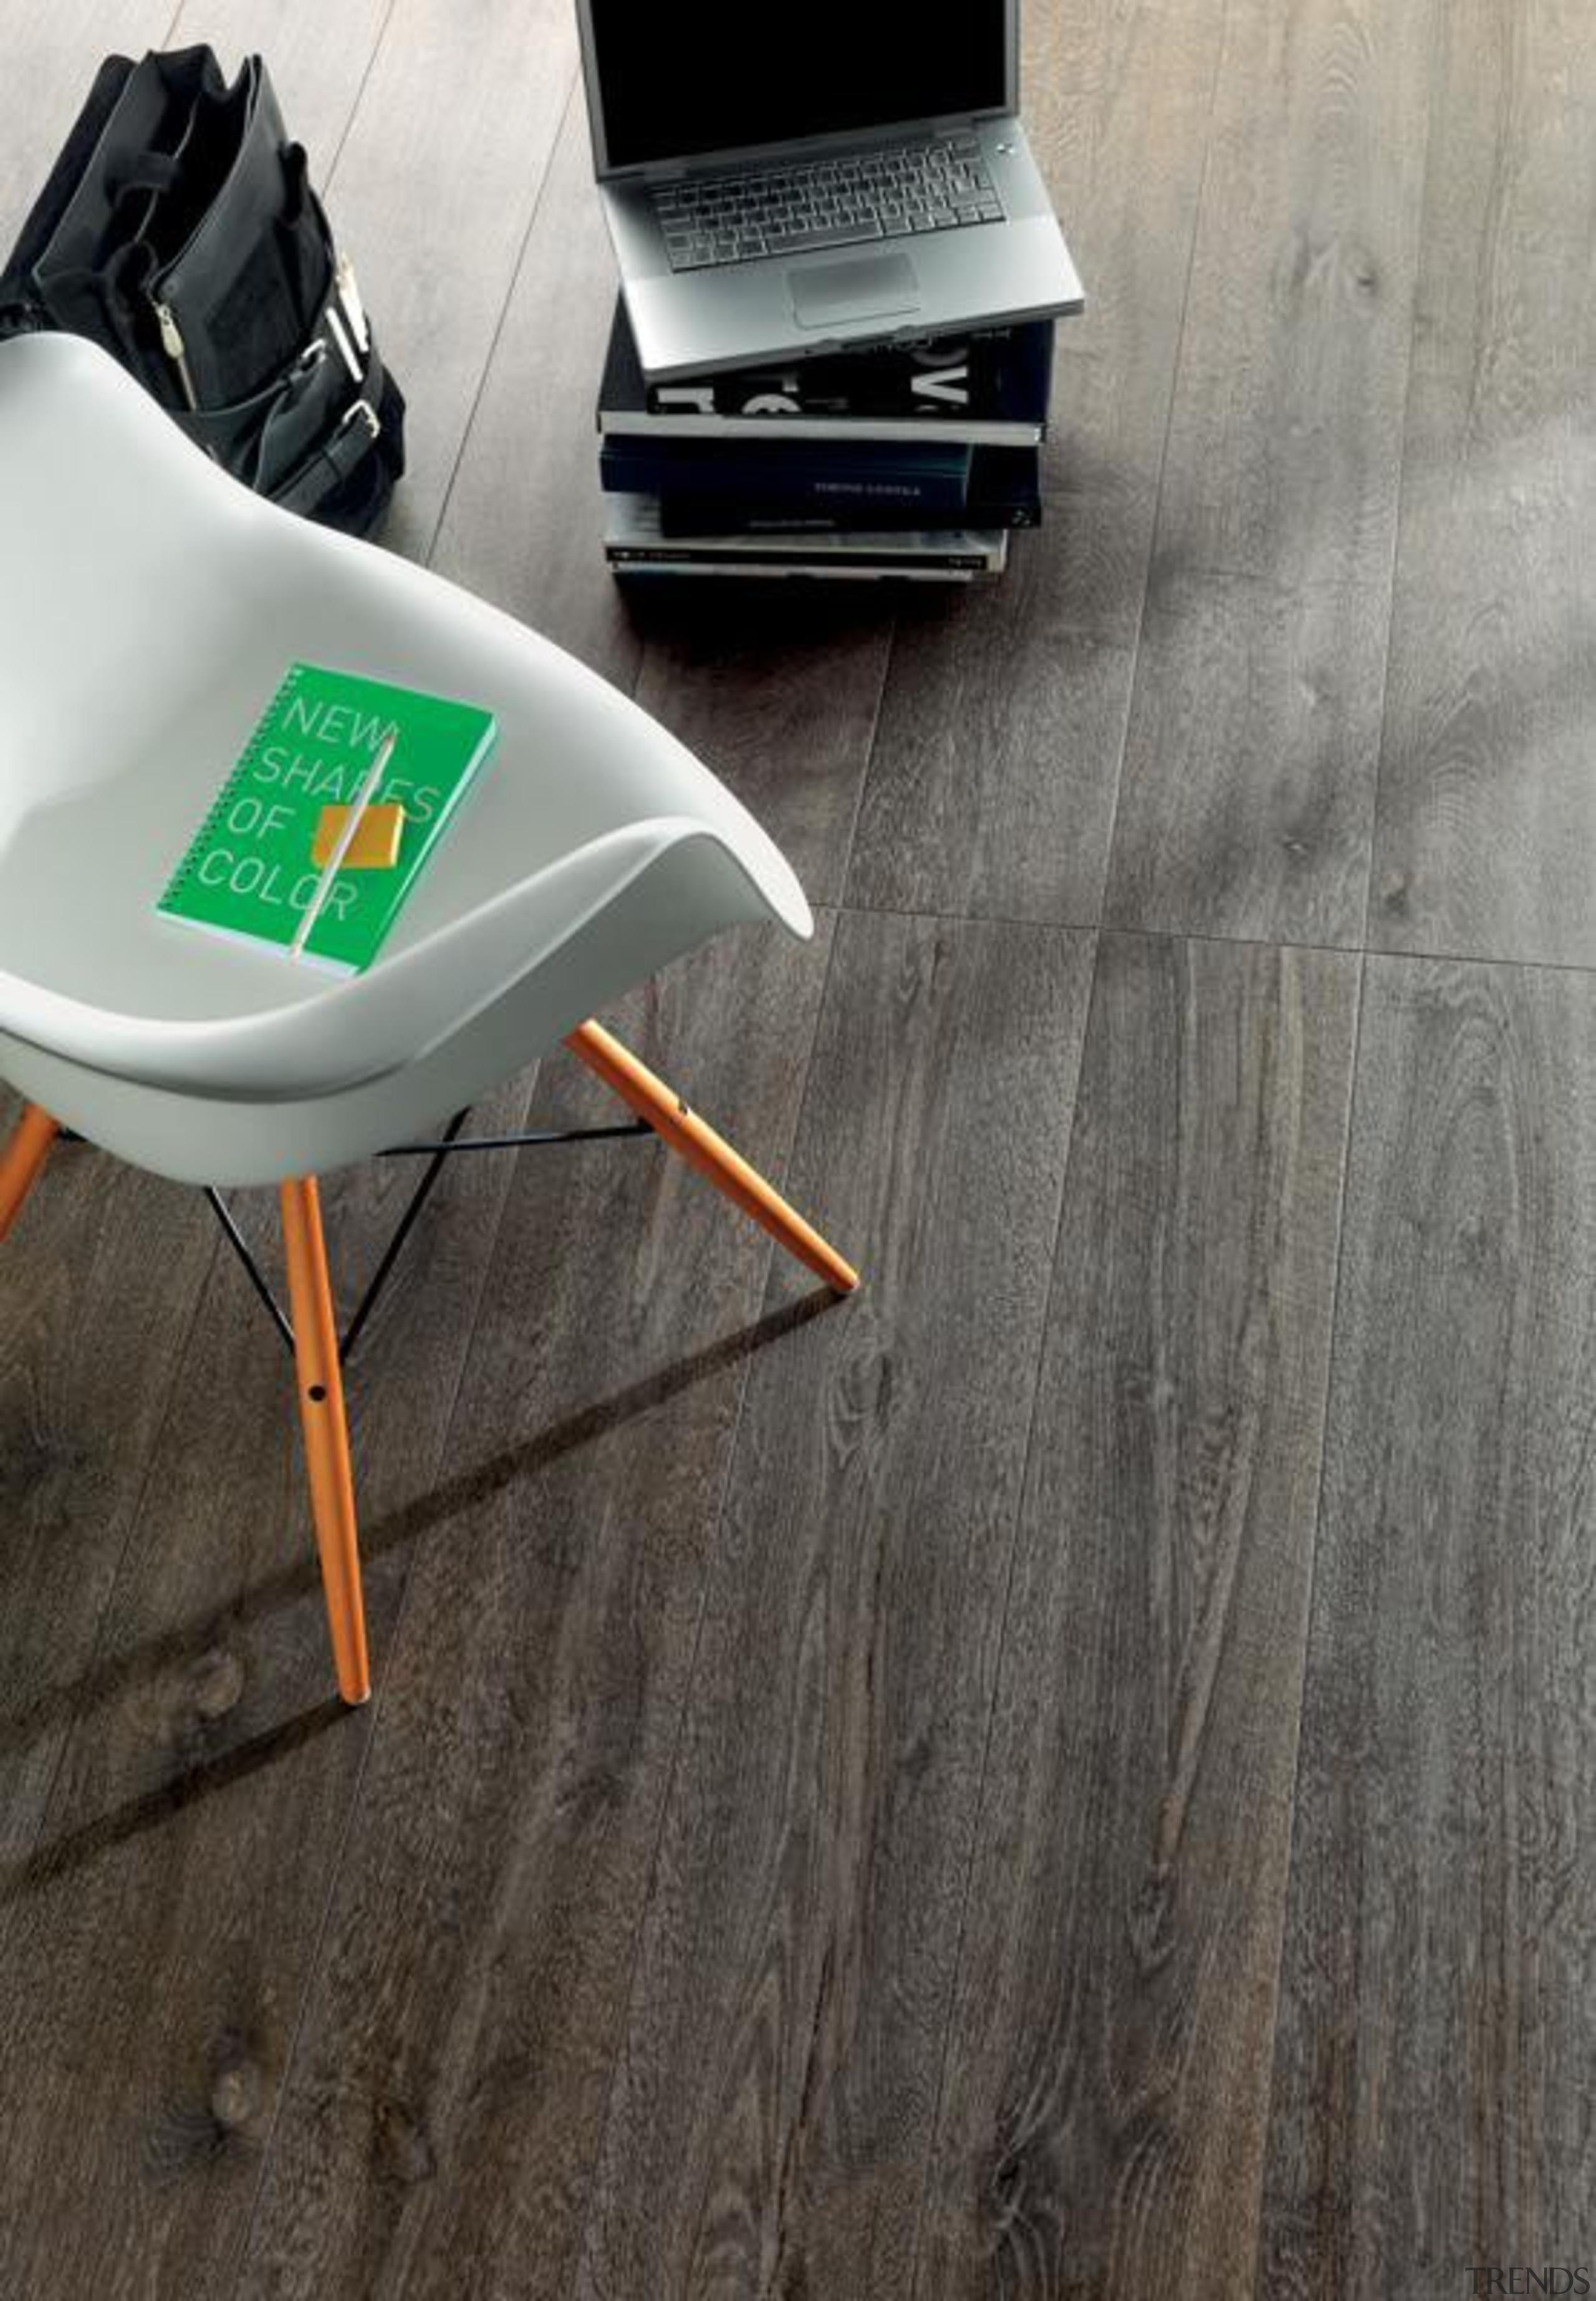 Bioplank fume interior living room floor tiles. - floor, flooring, hardwood, laminate flooring, product design, tile, wood, wood flooring, wood stain, gray, black